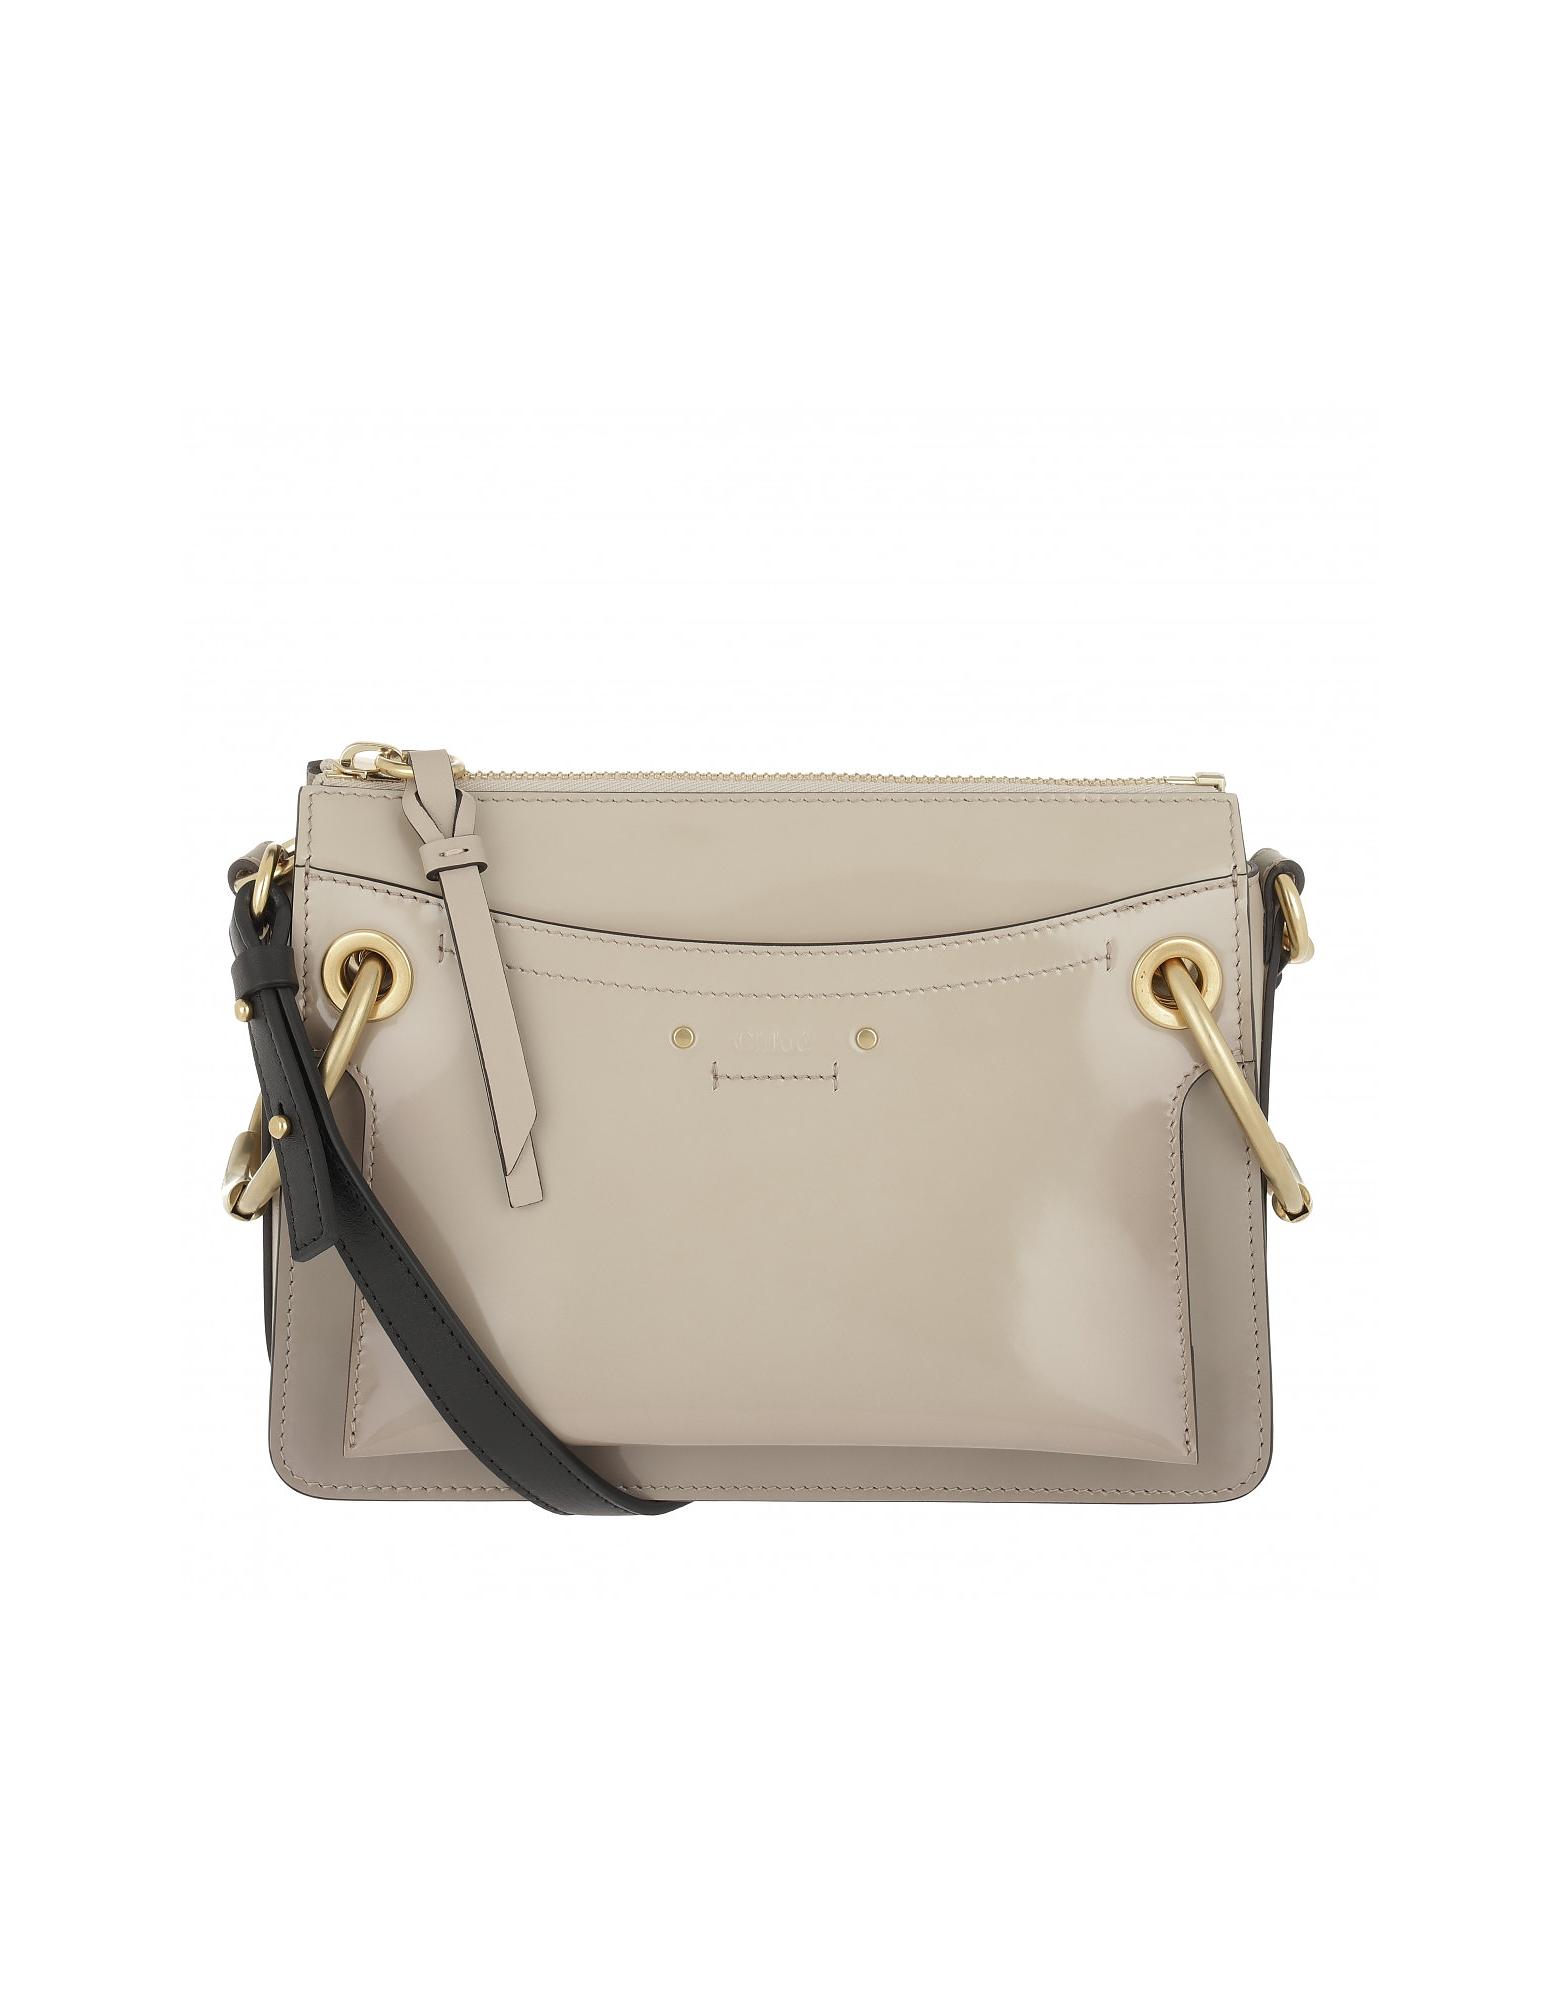 Chloe Handbags, Roy Bag Small Pastel Grey